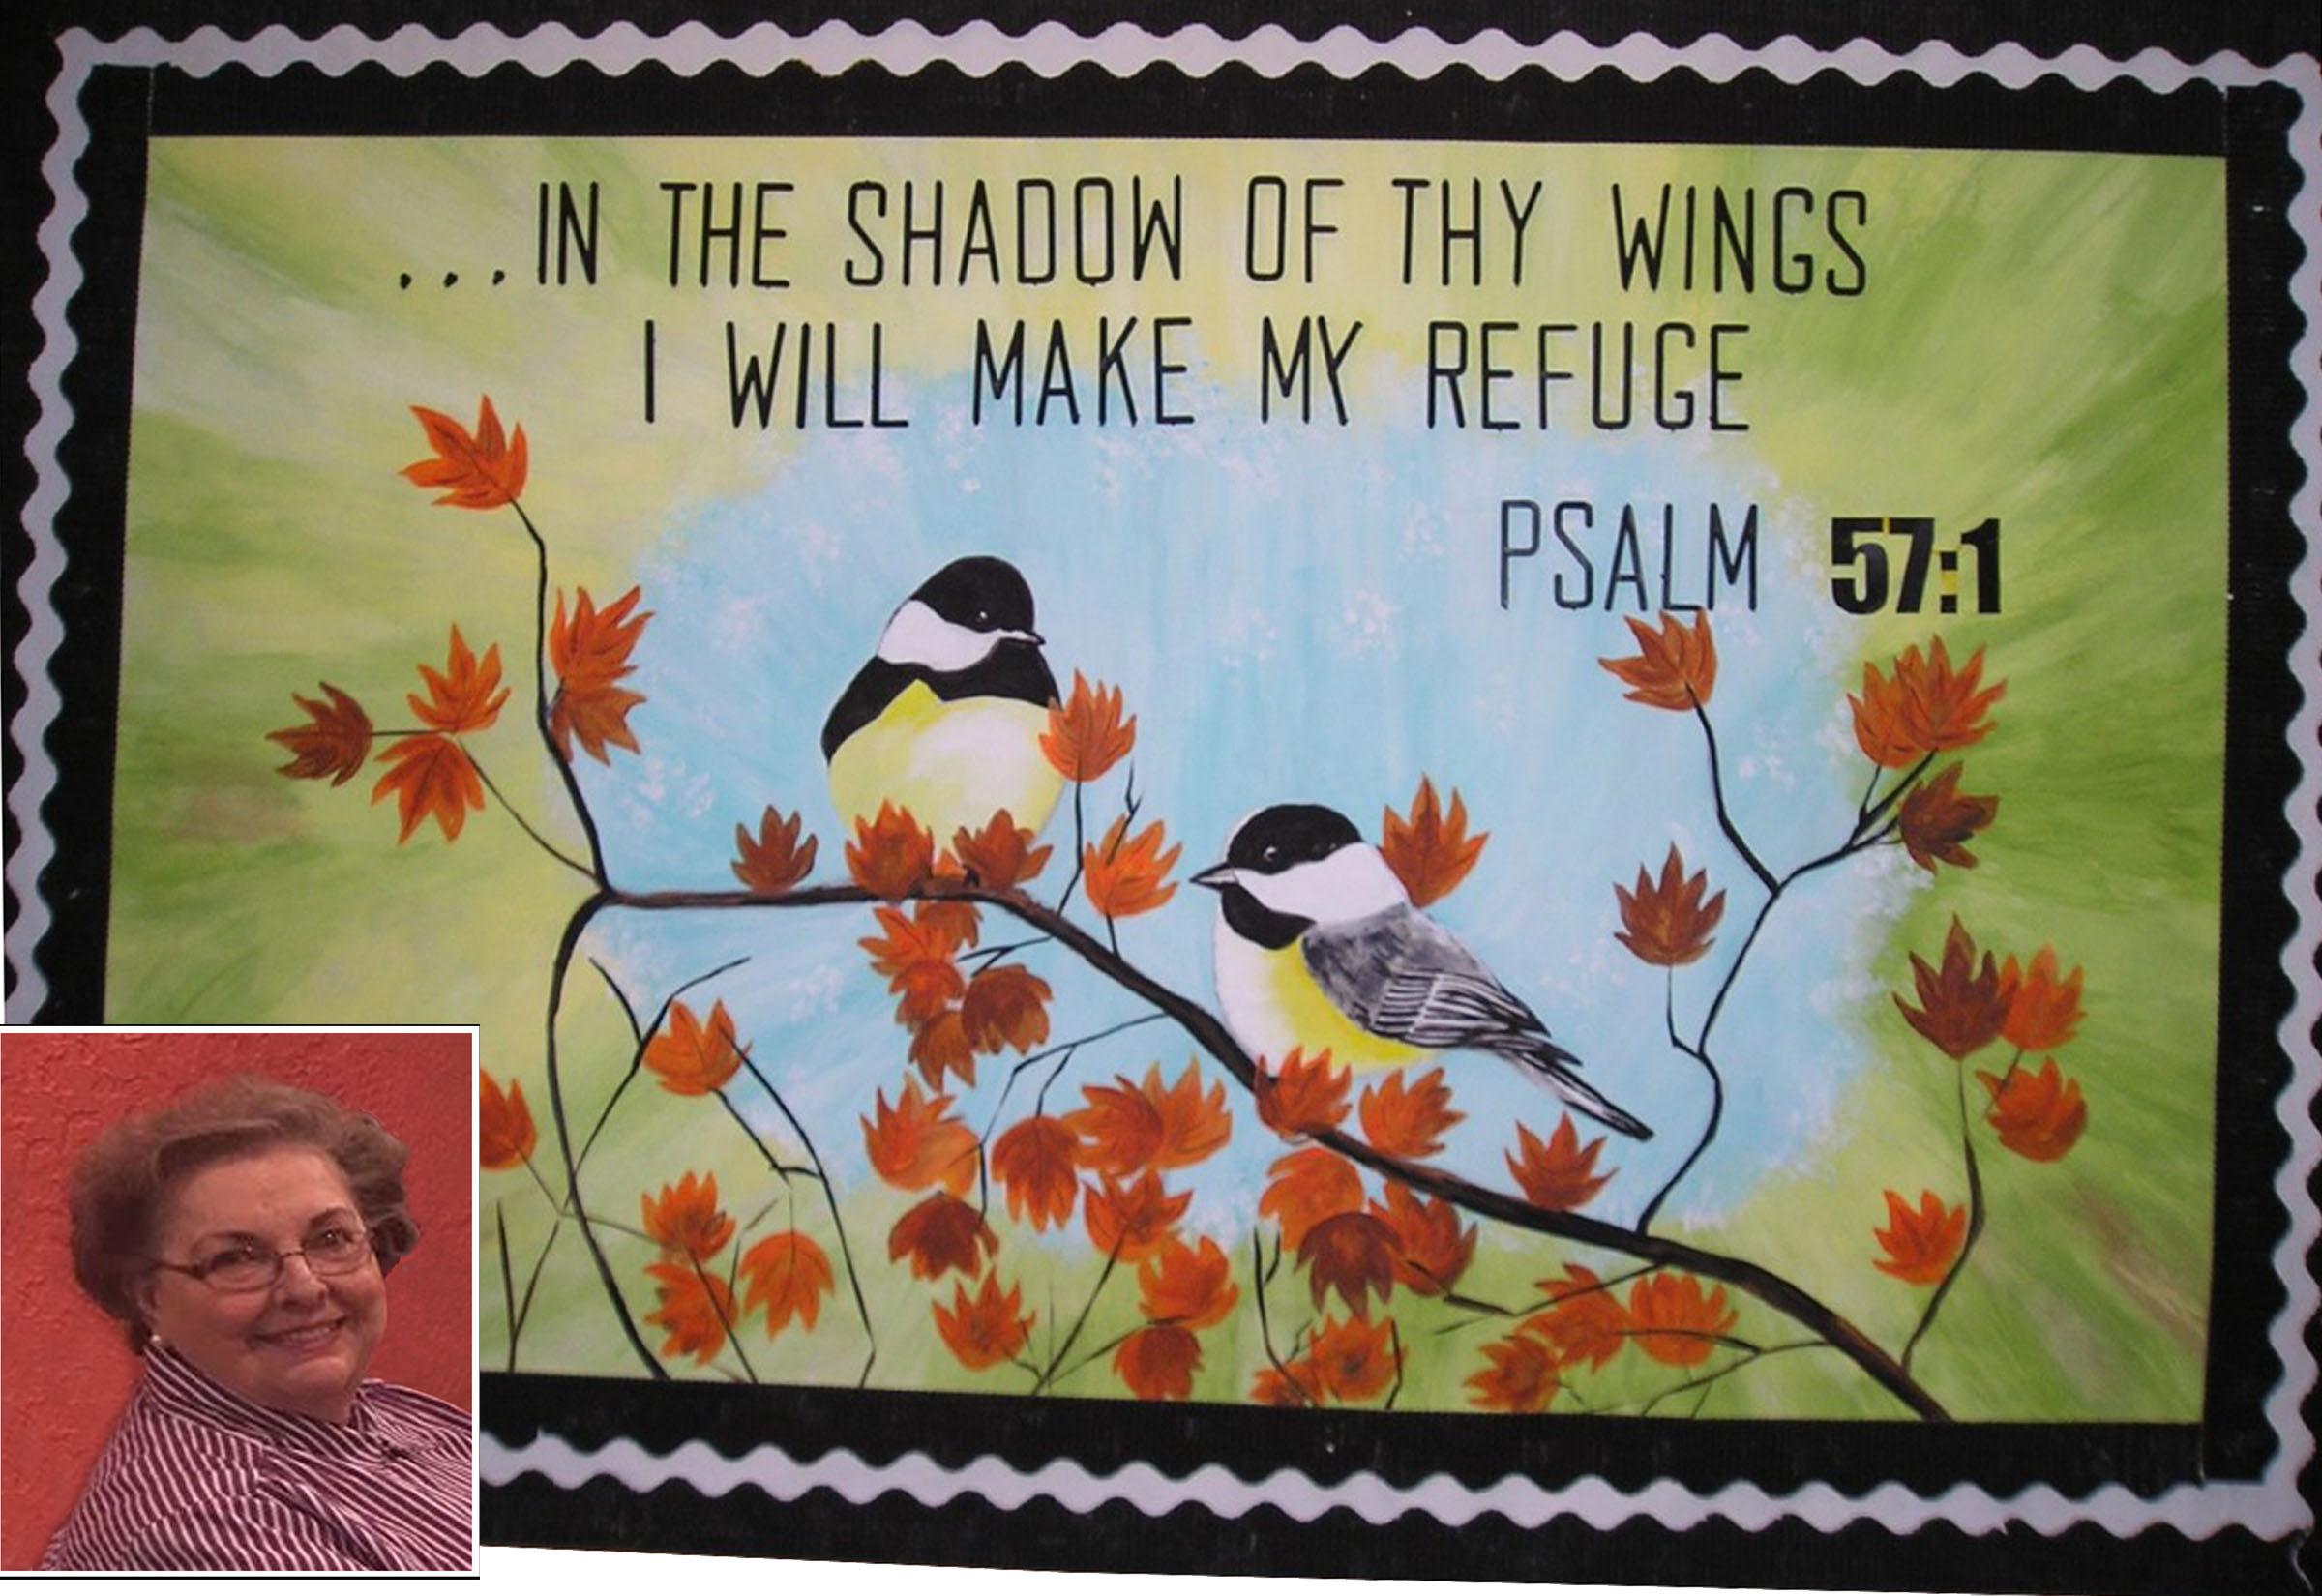 Artist paints church bulletin boards to teach